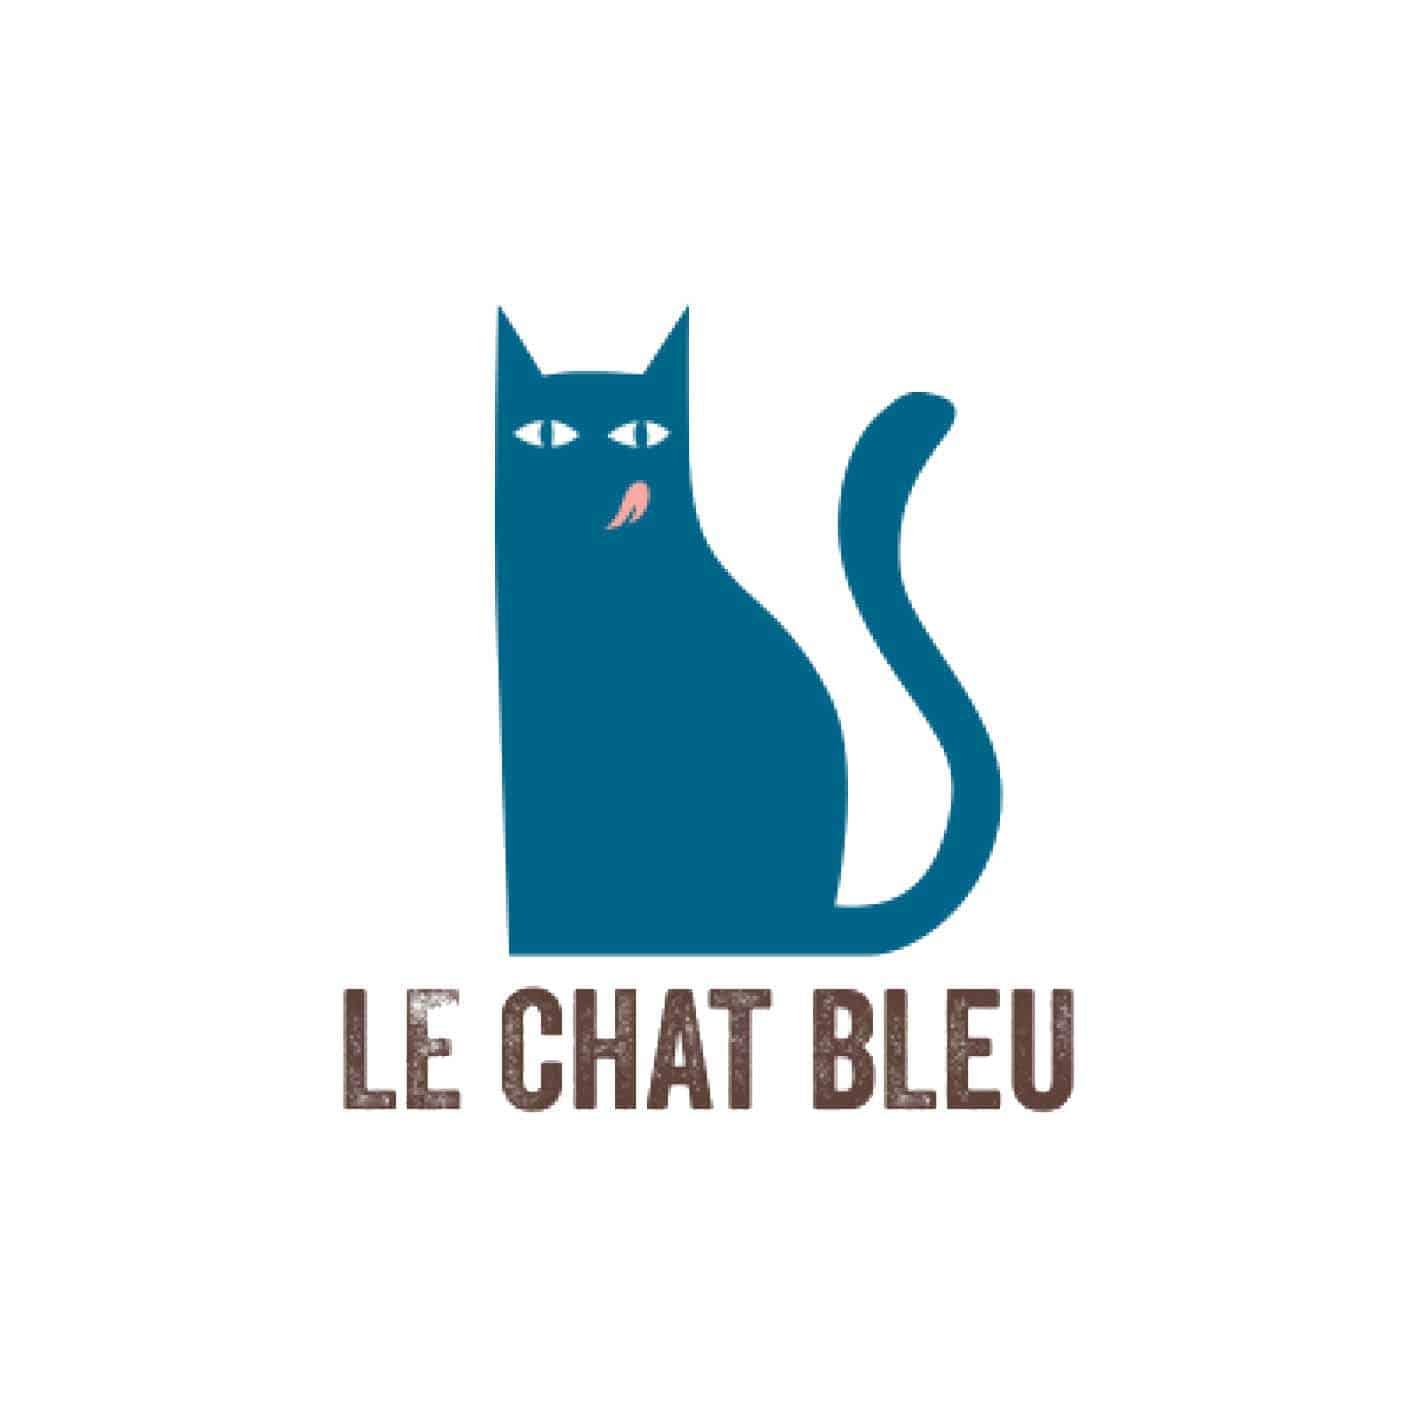 1964-communication-le-havre-logo-chat